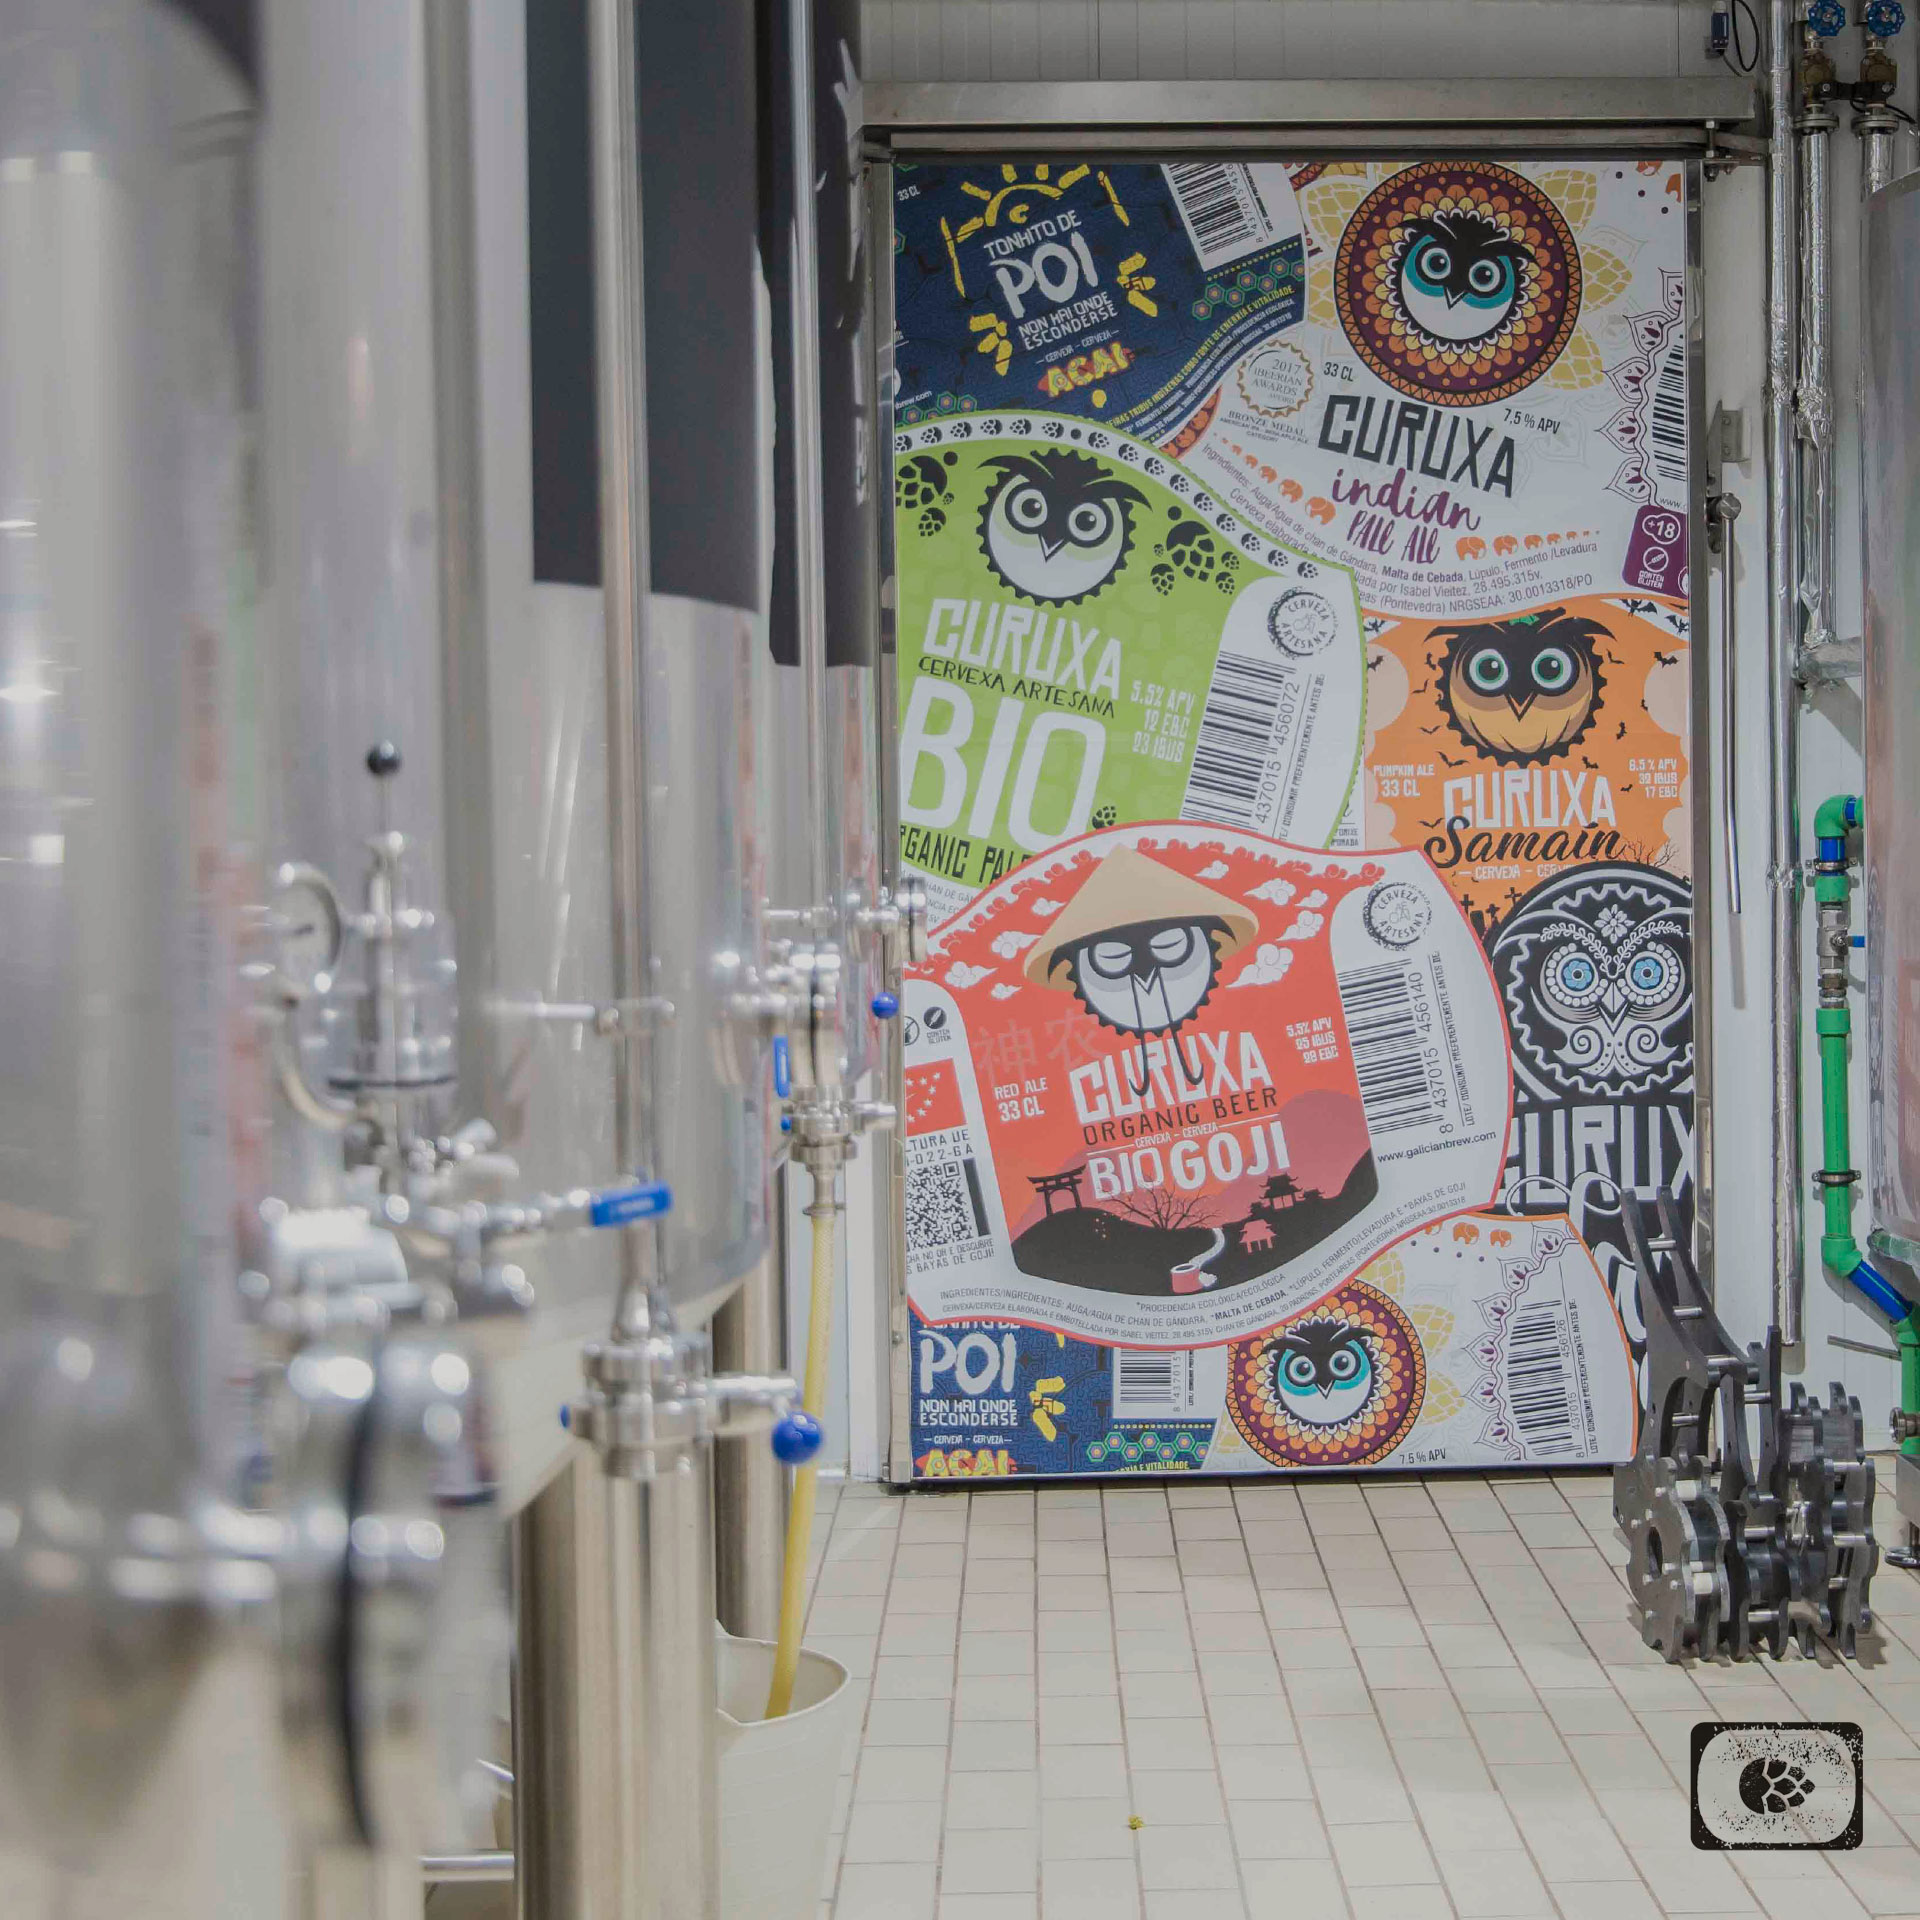 Galician Brew fabrica